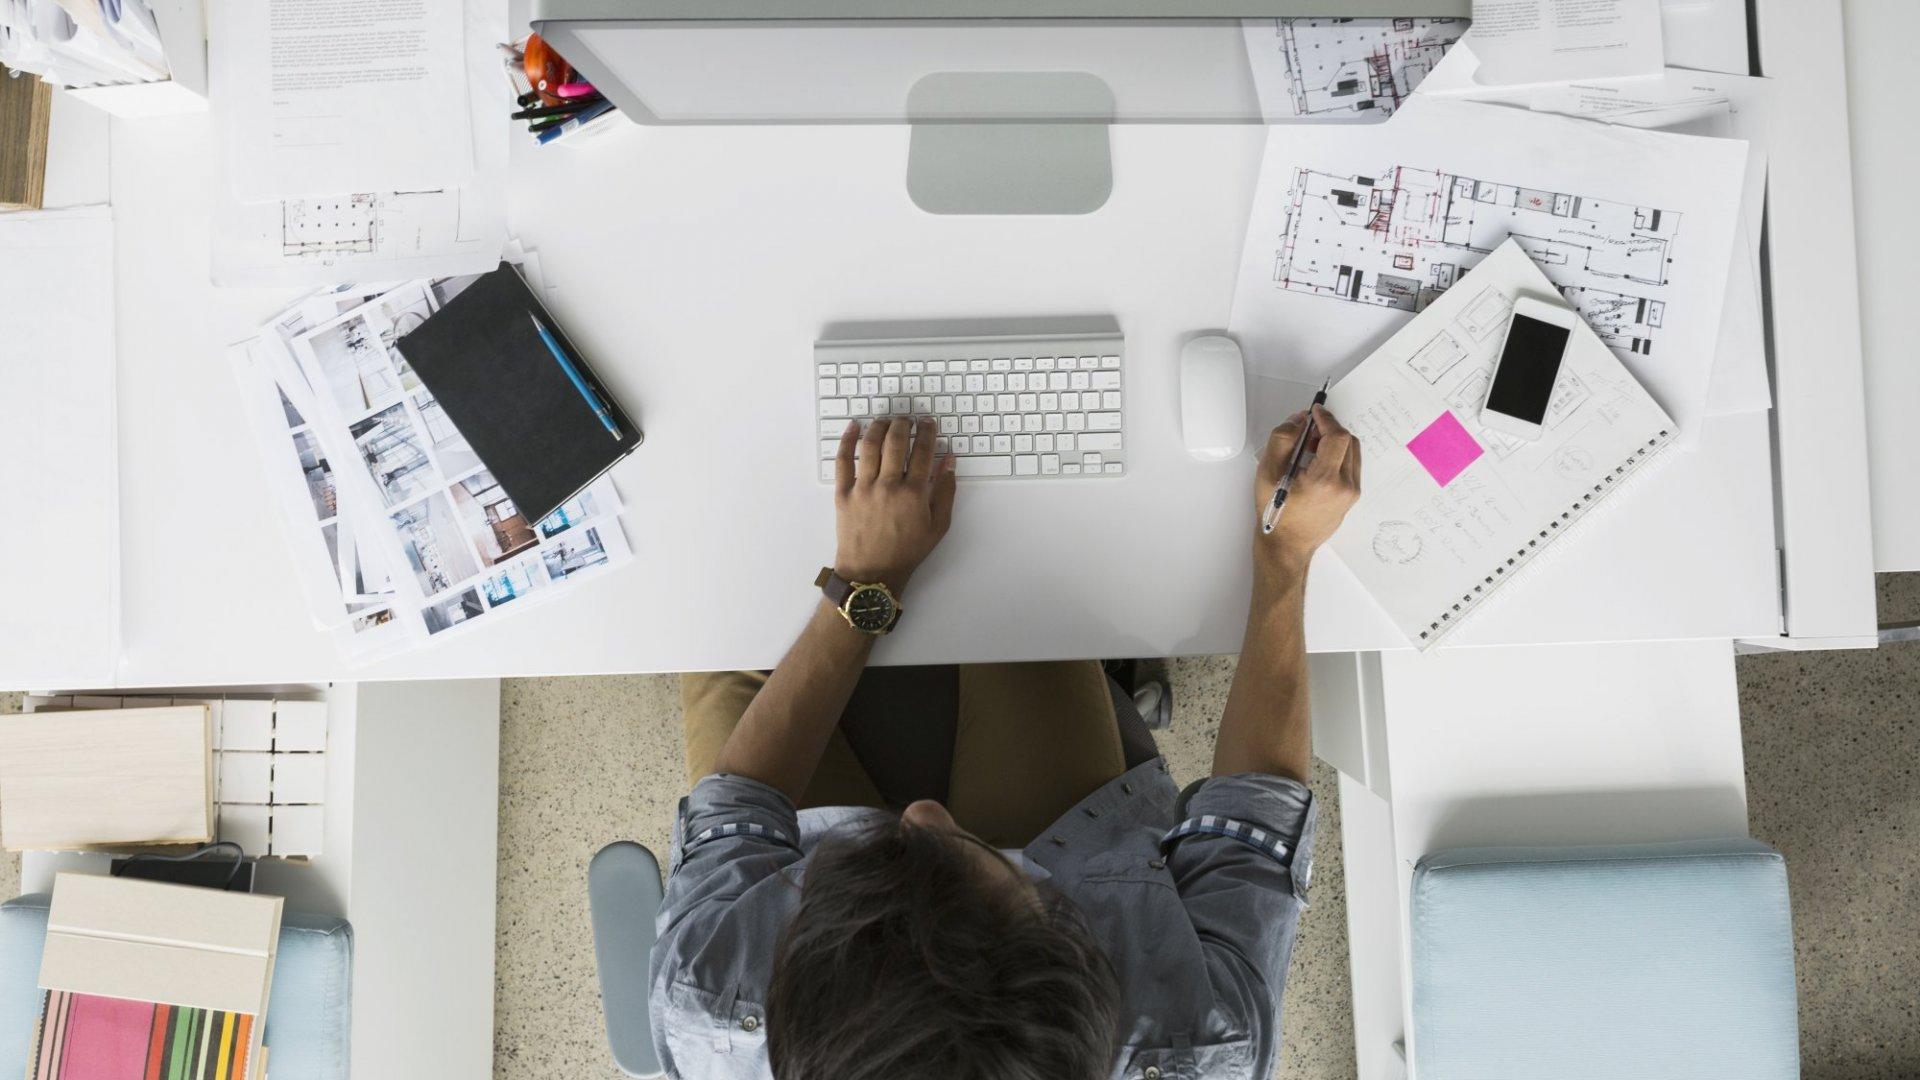 How to Jumpstart Your 2017 Career Goals